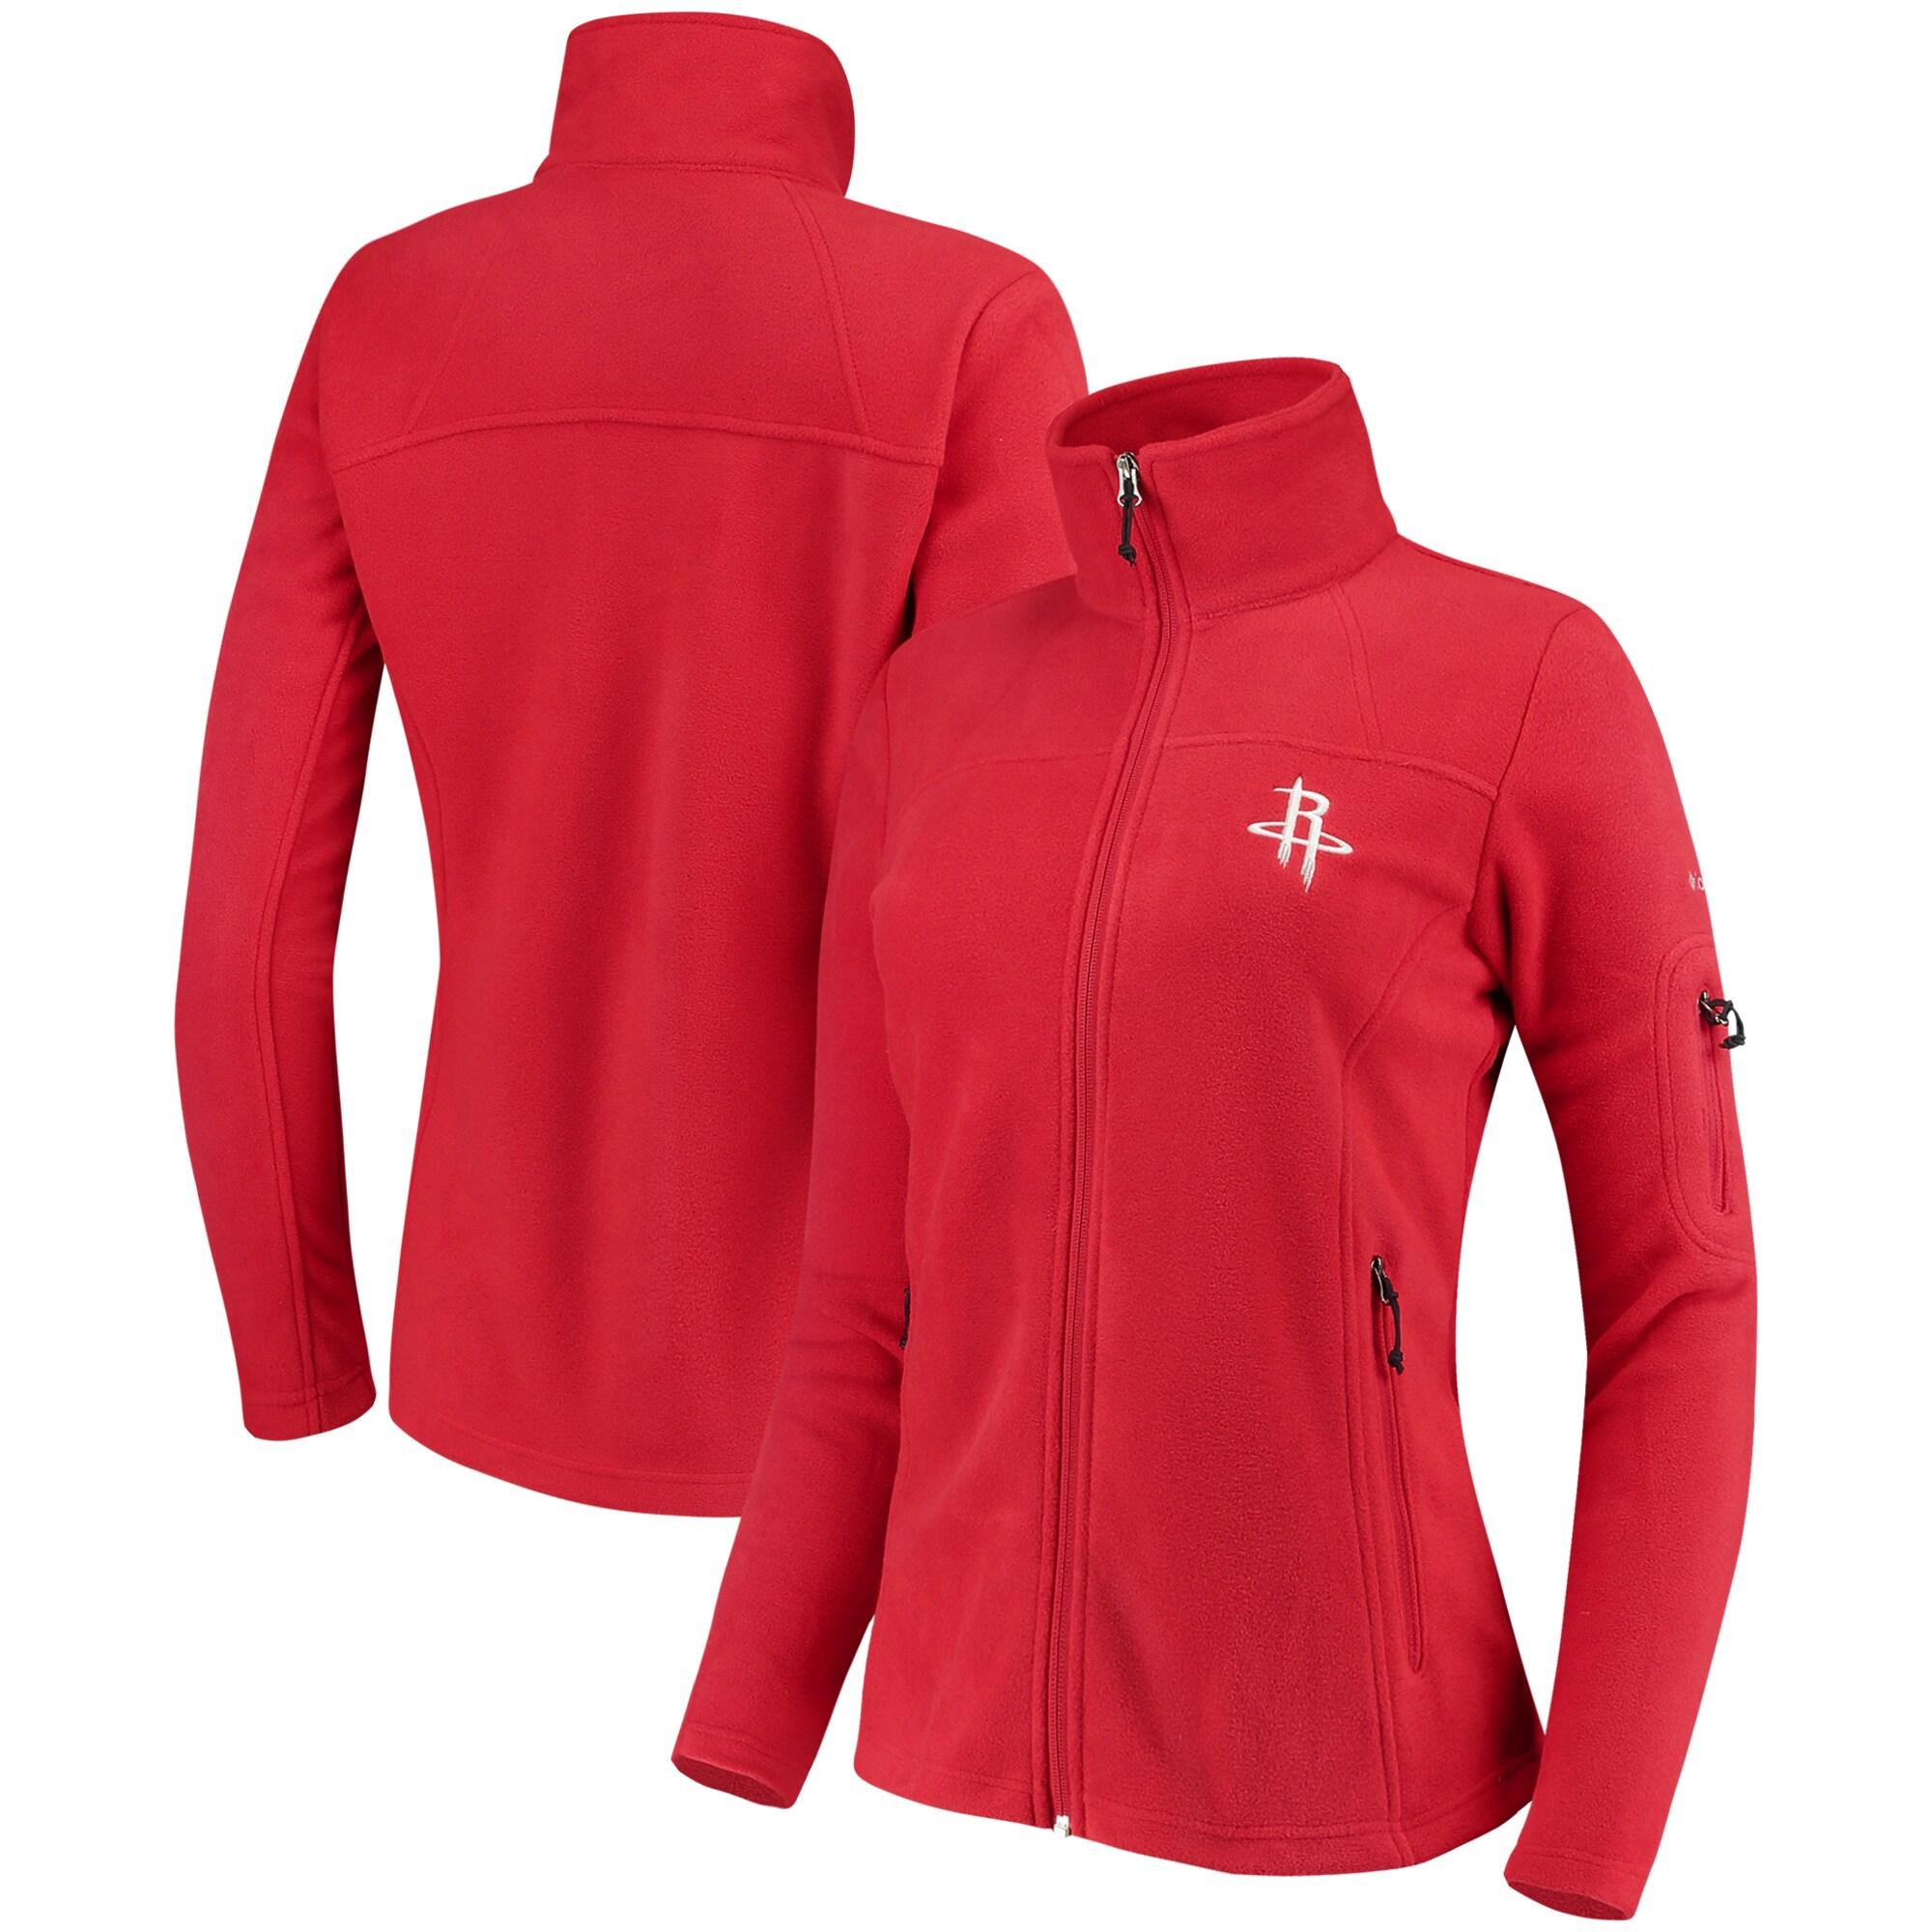 Houston Rockets Columbia Women's Give & Go Full-Zip Jacket - Red